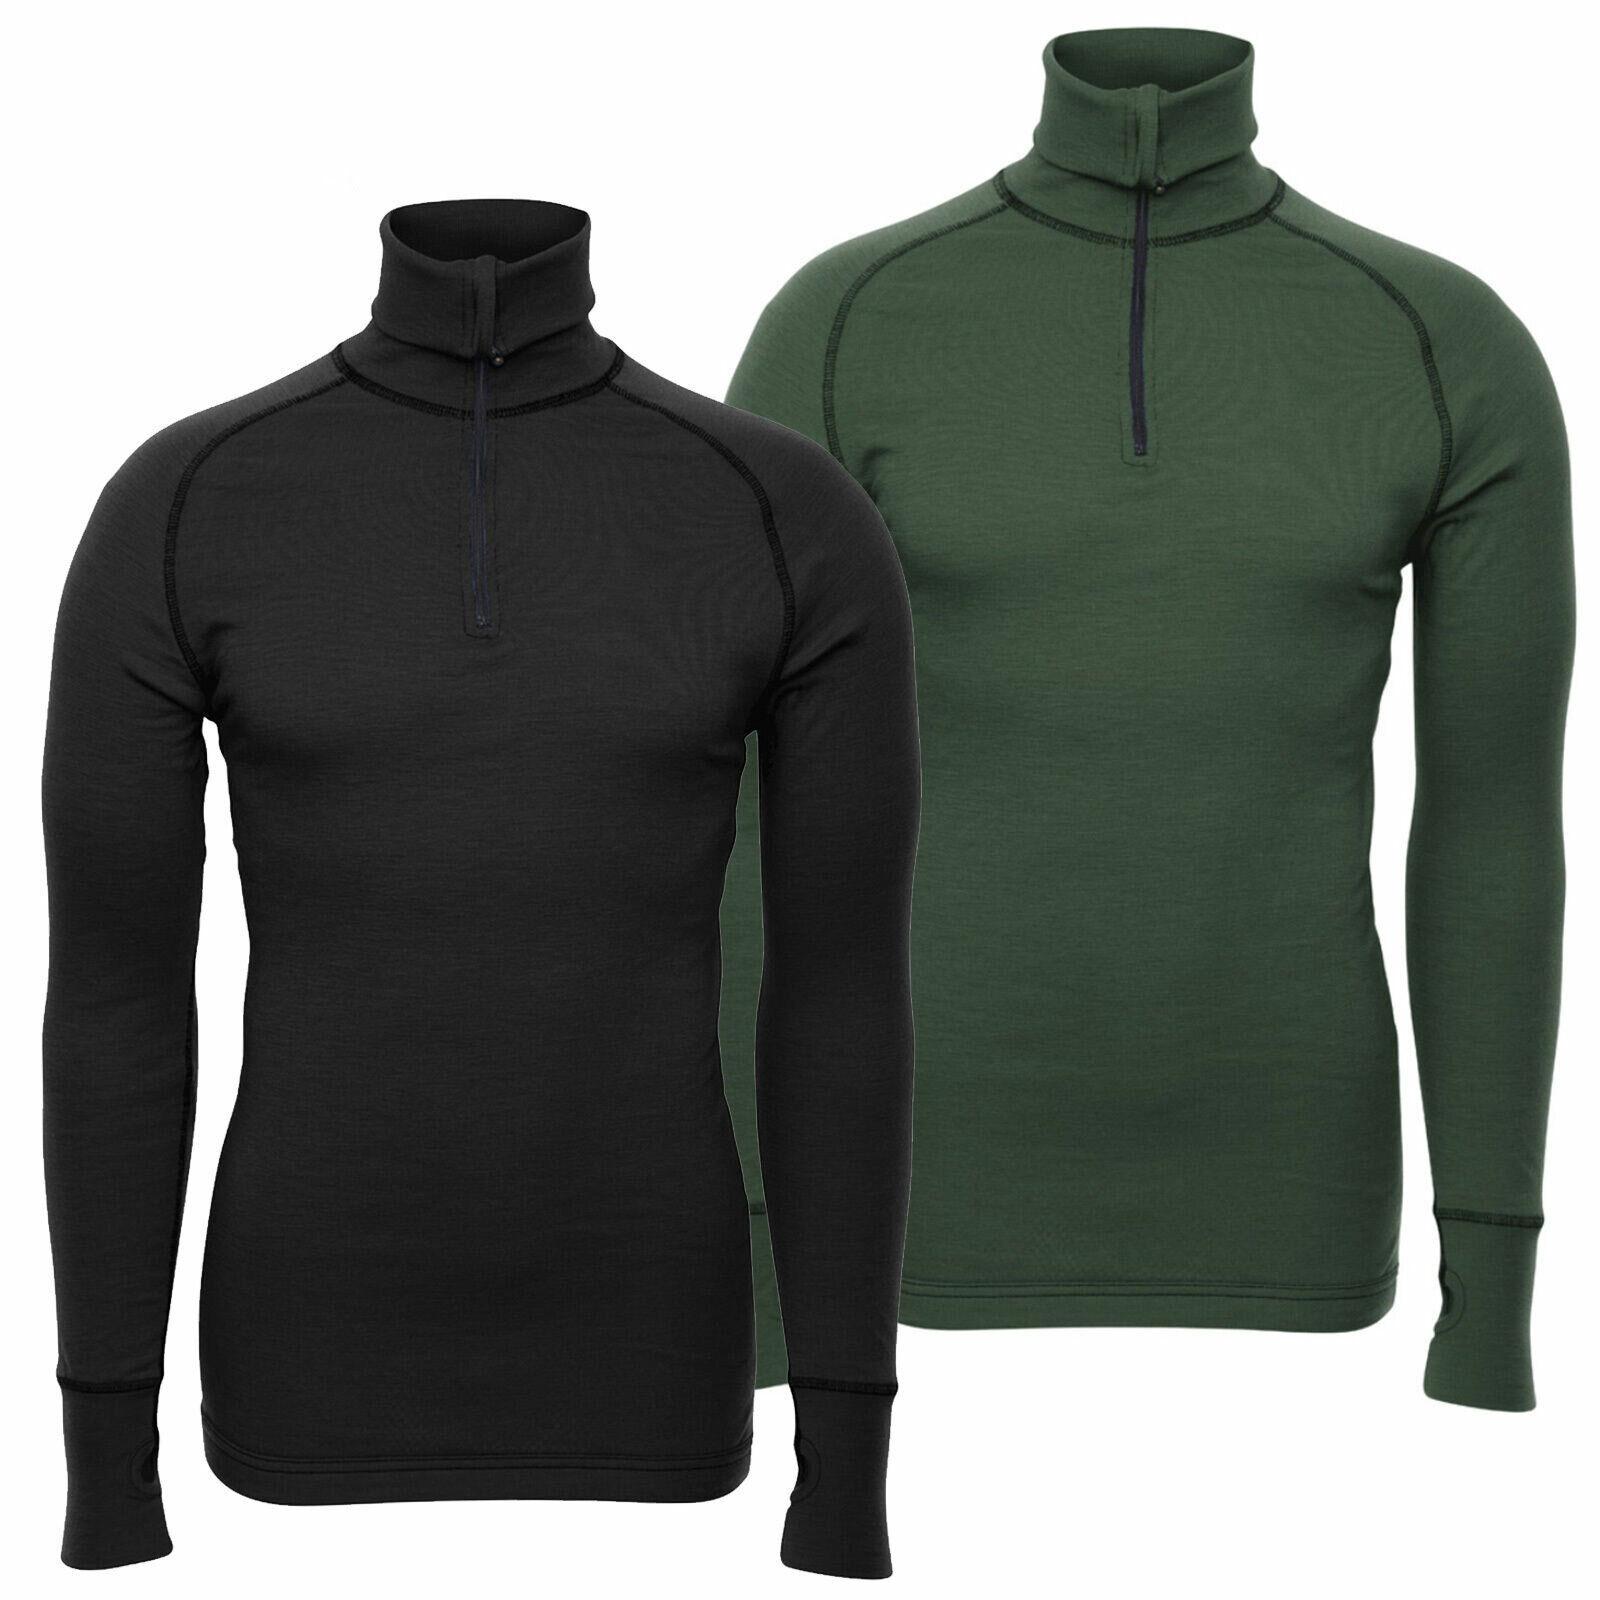 Brynje Arctic Double 1/4 Zip Polo Neck Warm Thermal Merino Wool Base Layer Shirt